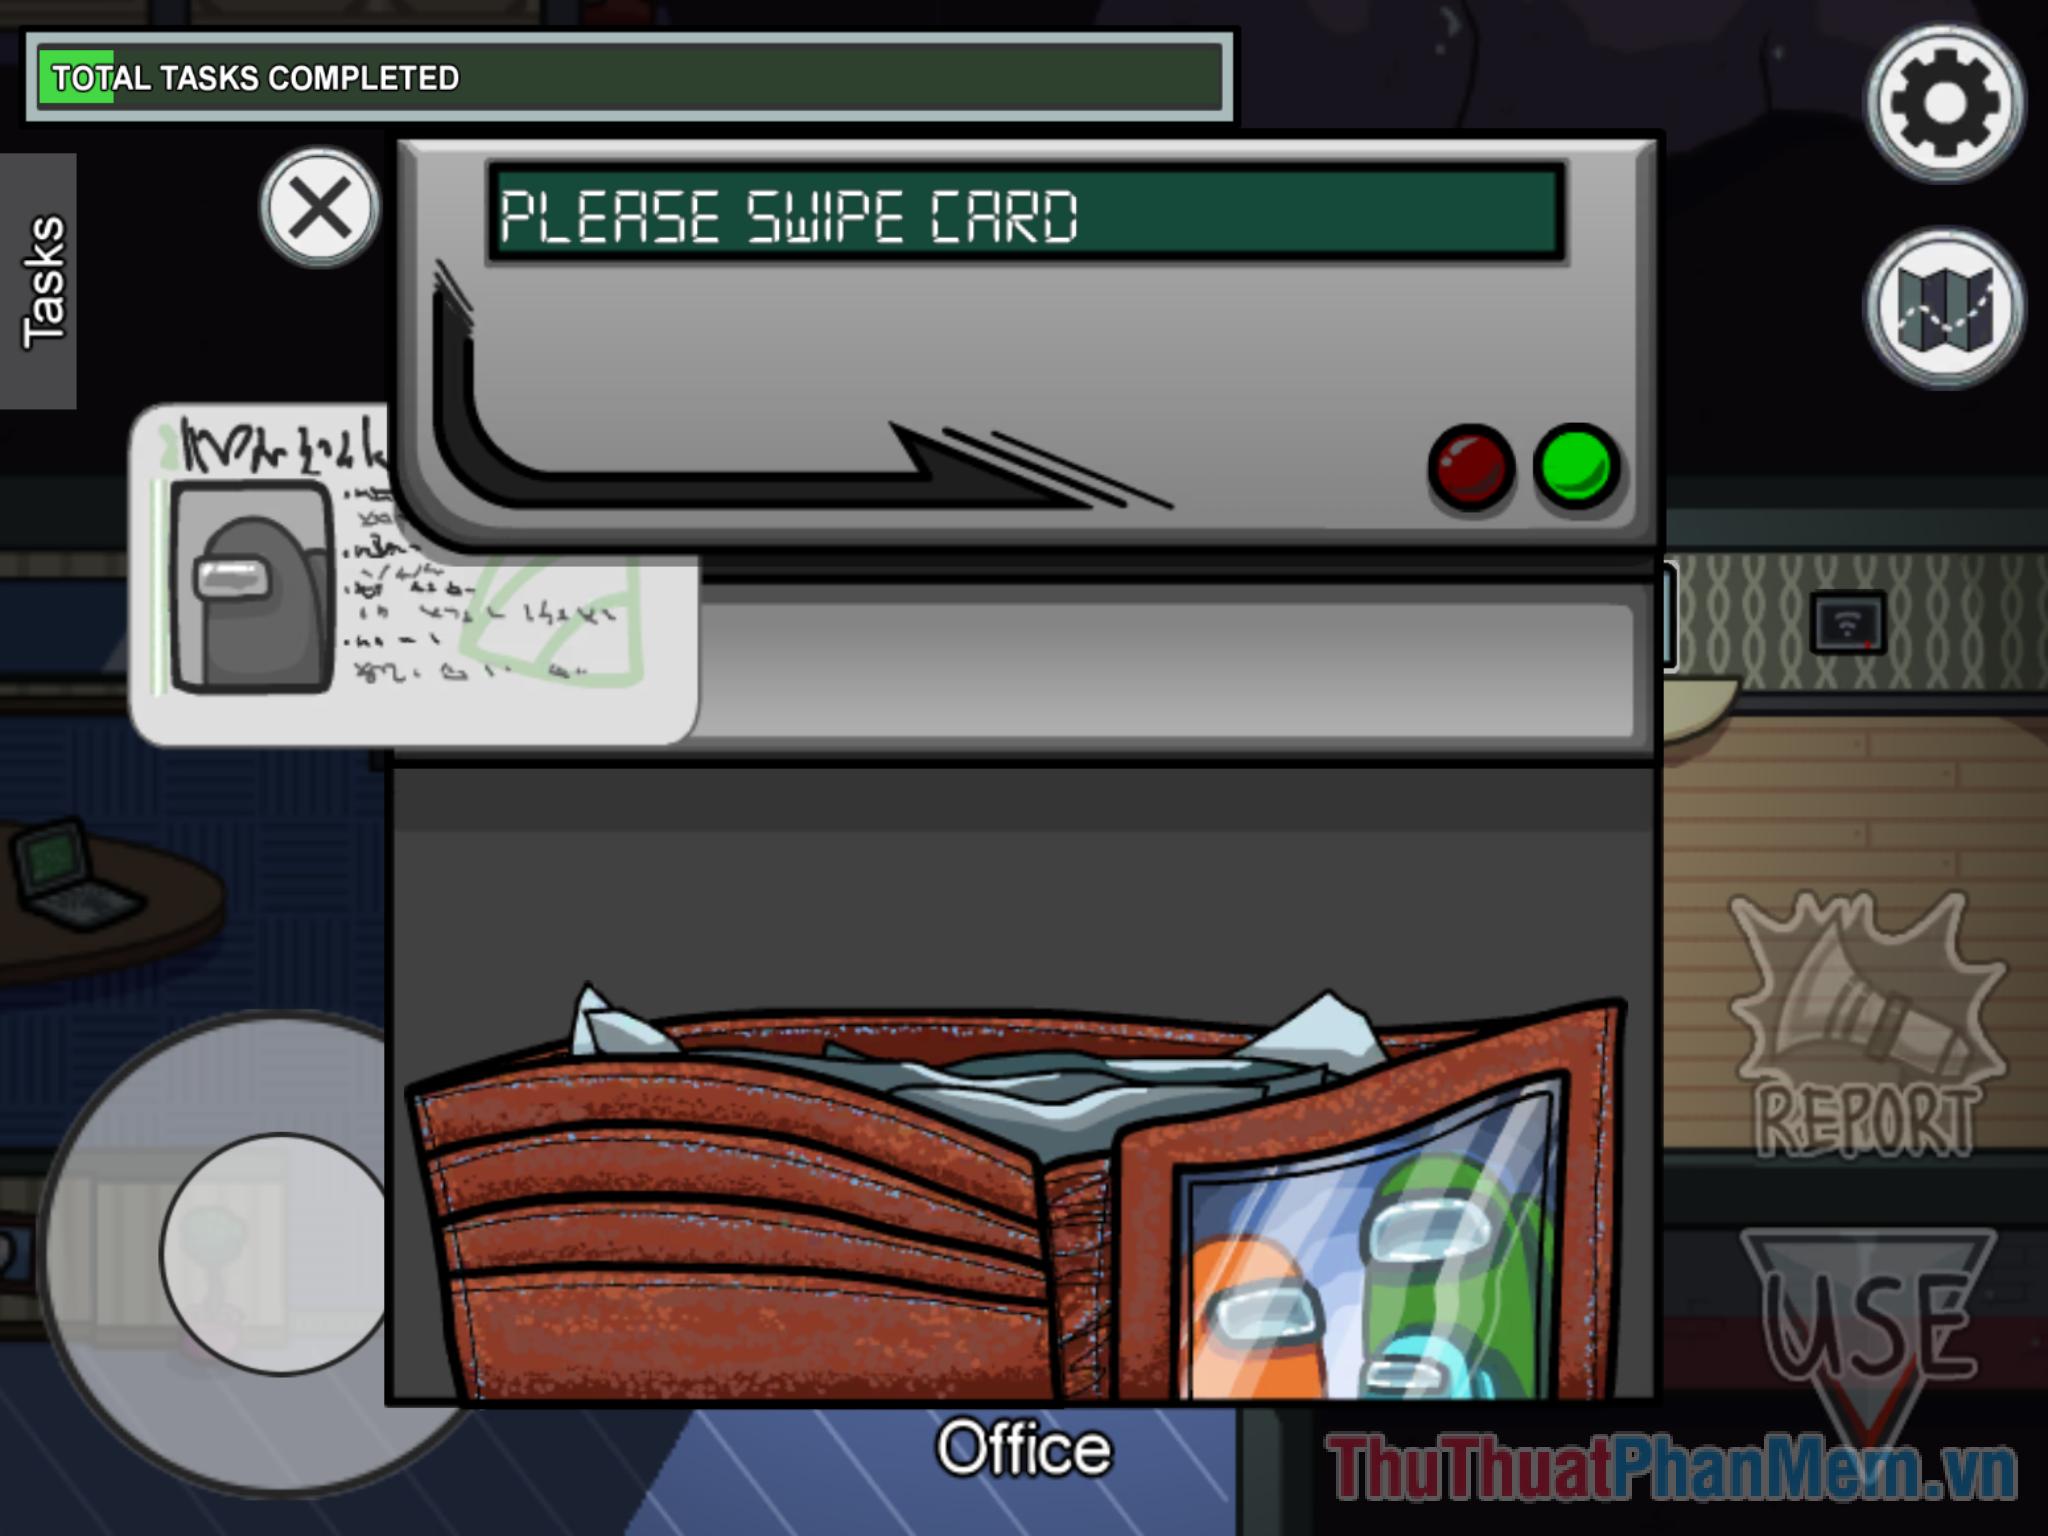 Quẹt thẻ (Swipe Card)